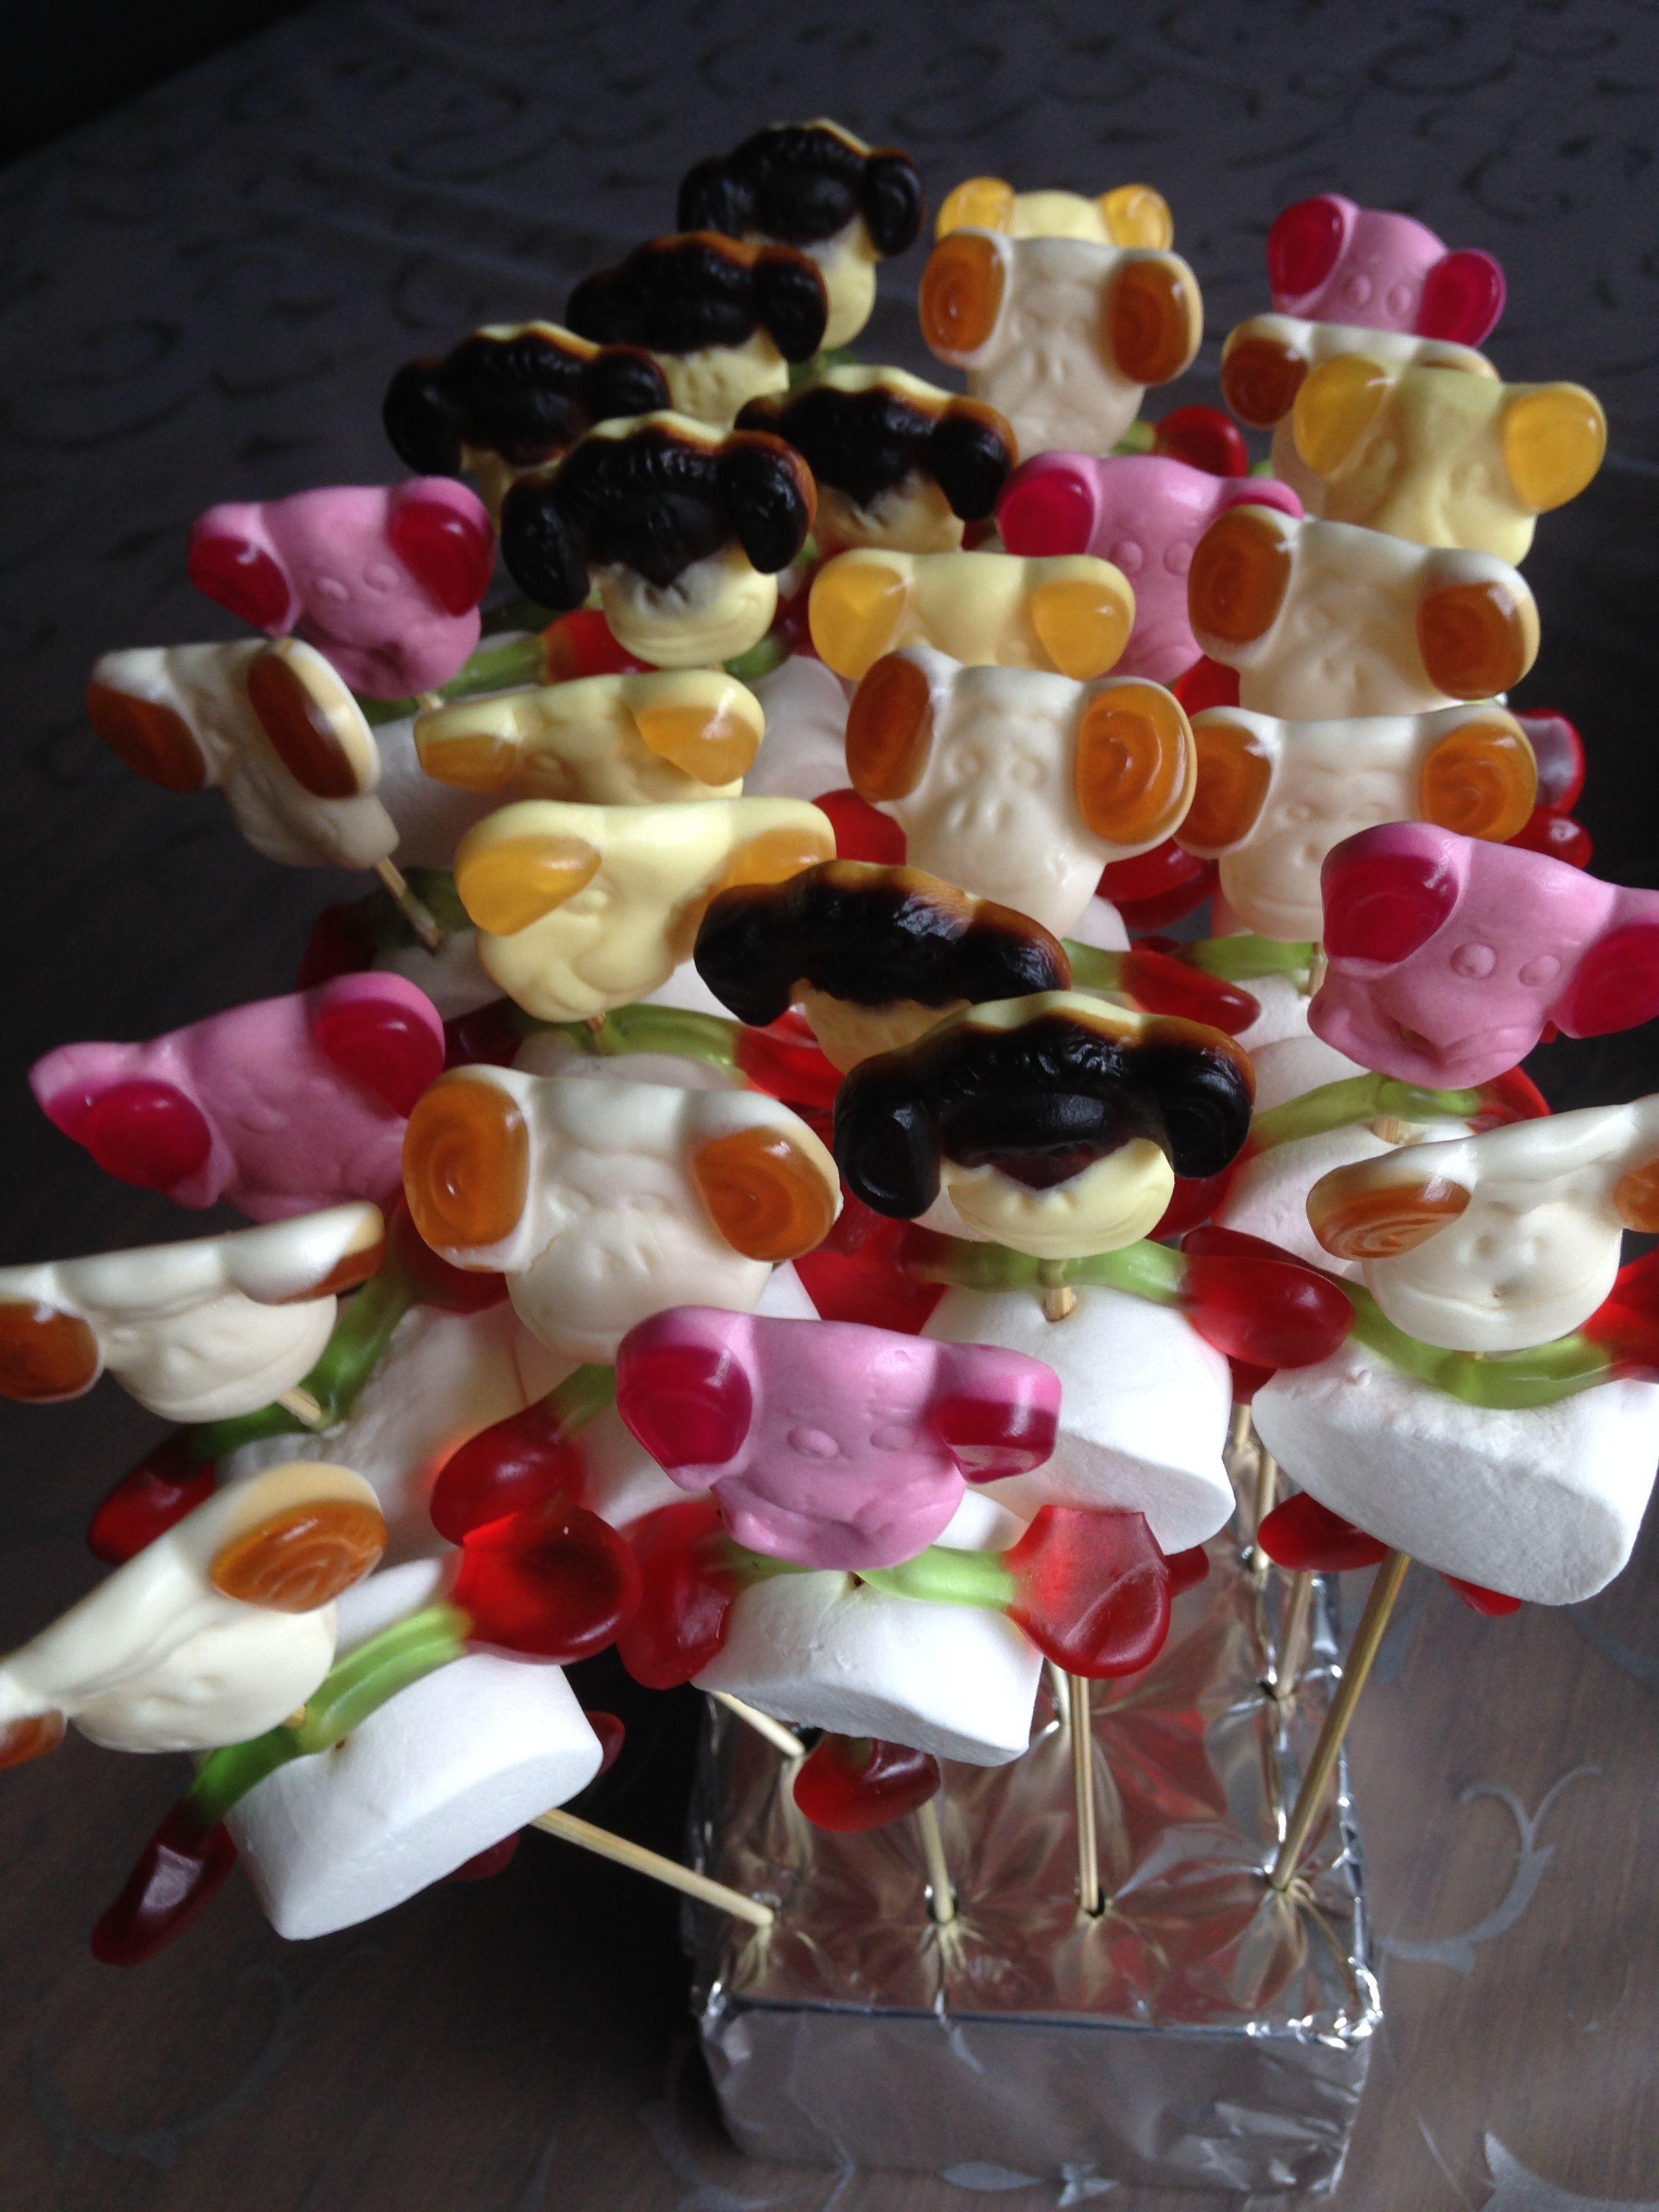 Traktatie (glutenvrij)gemaakt van marshmallows (Frisia ... Smarties Glutenvrij